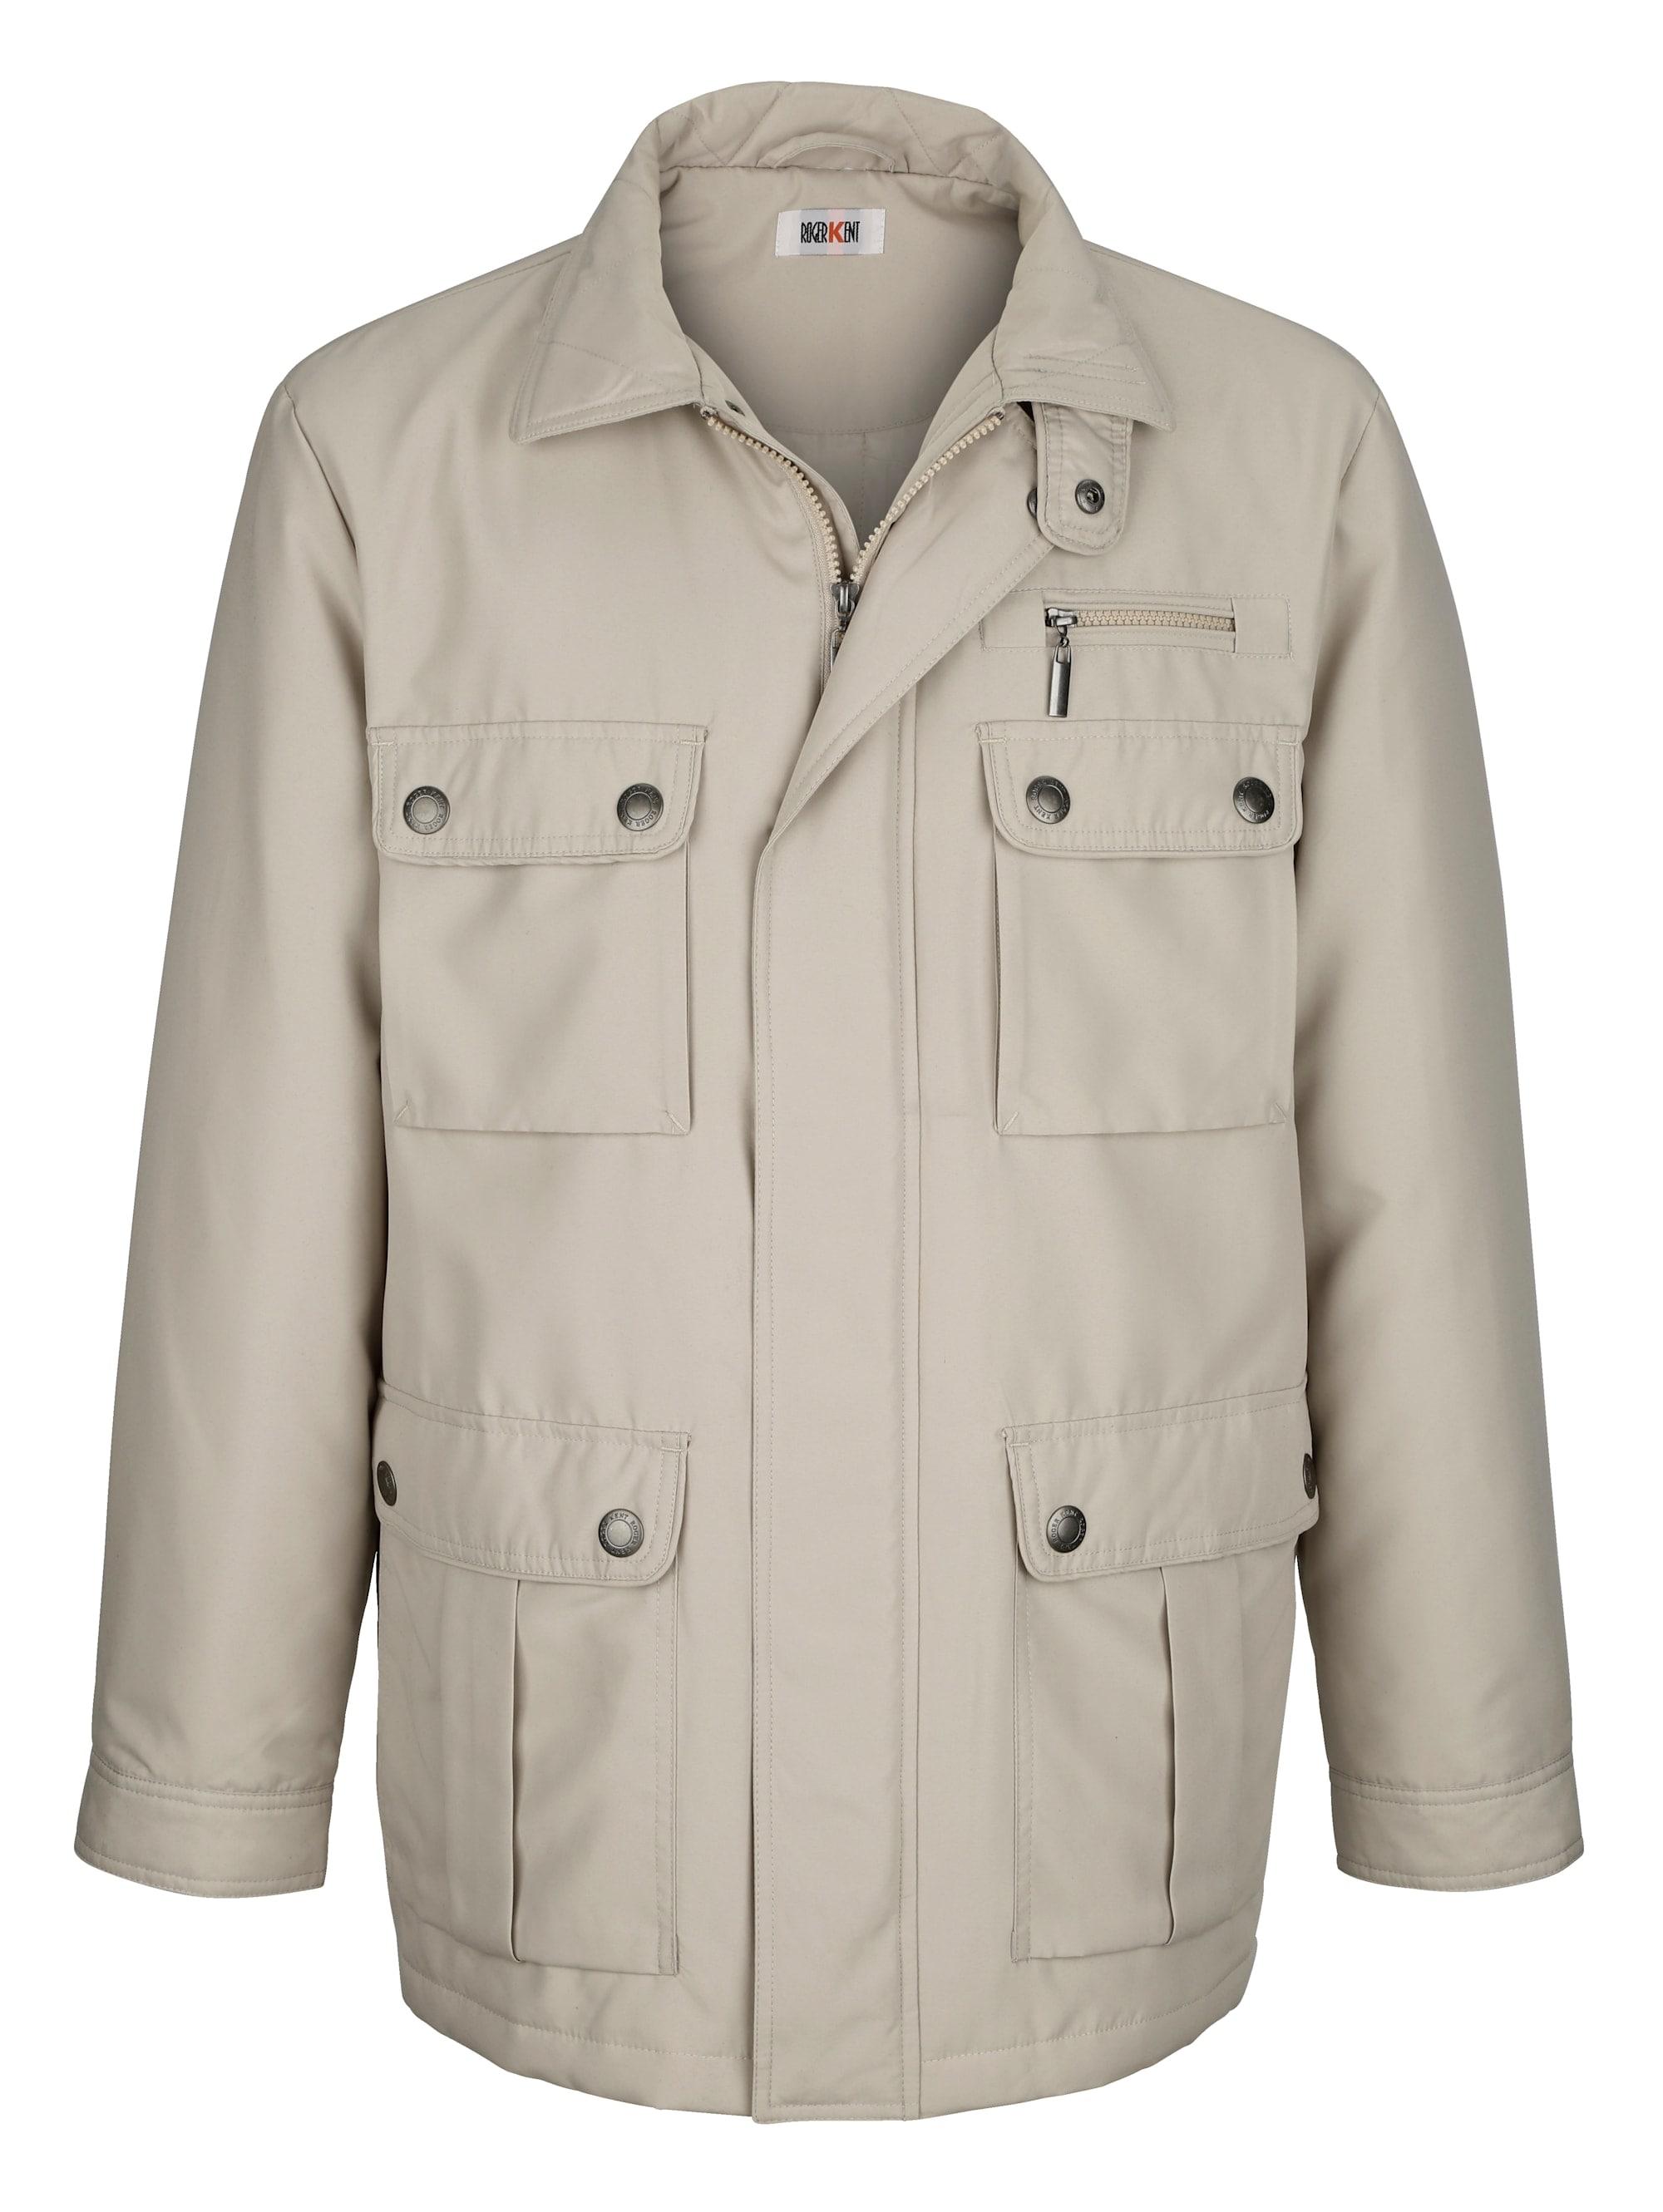 Roger Kent Longjacke mit vielen praktischen Taschen | Bekleidung > Jacken > Fieldjackets | Roger Kent